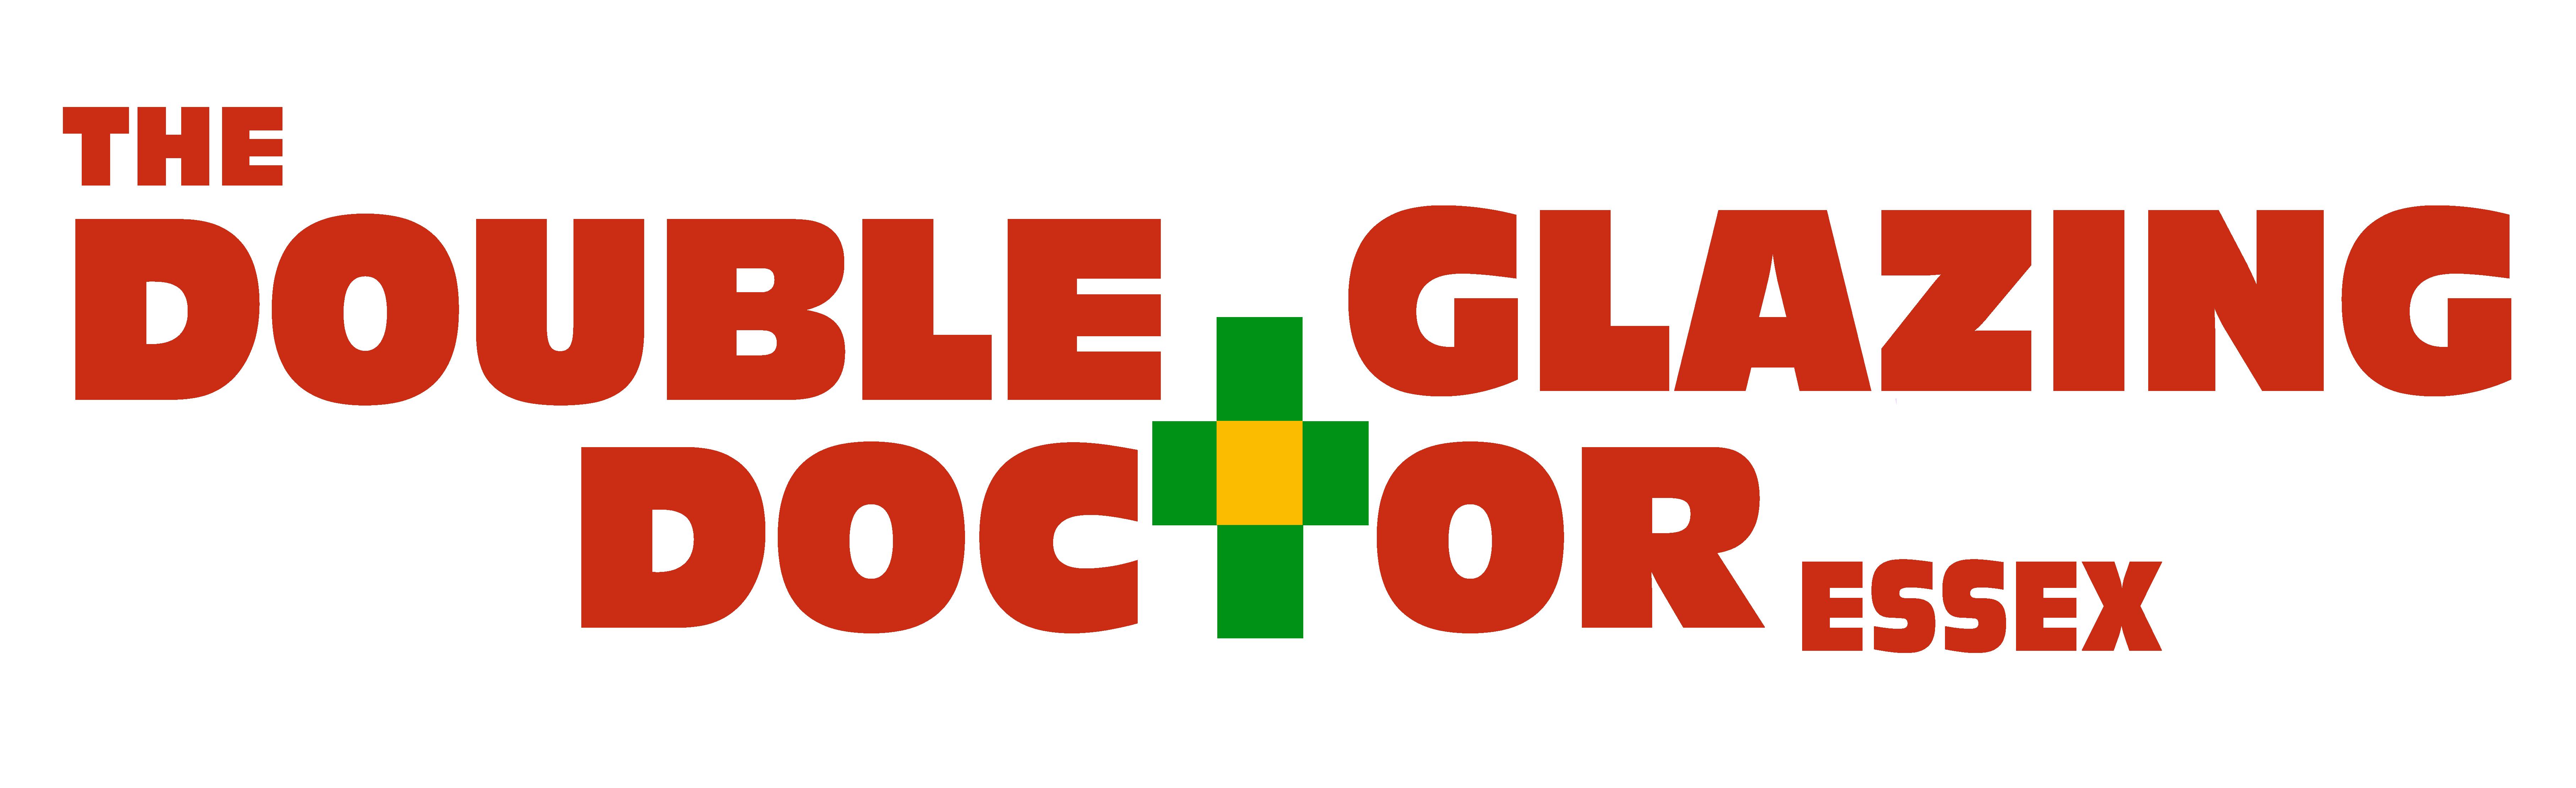 Double Glazing Doctor Essex